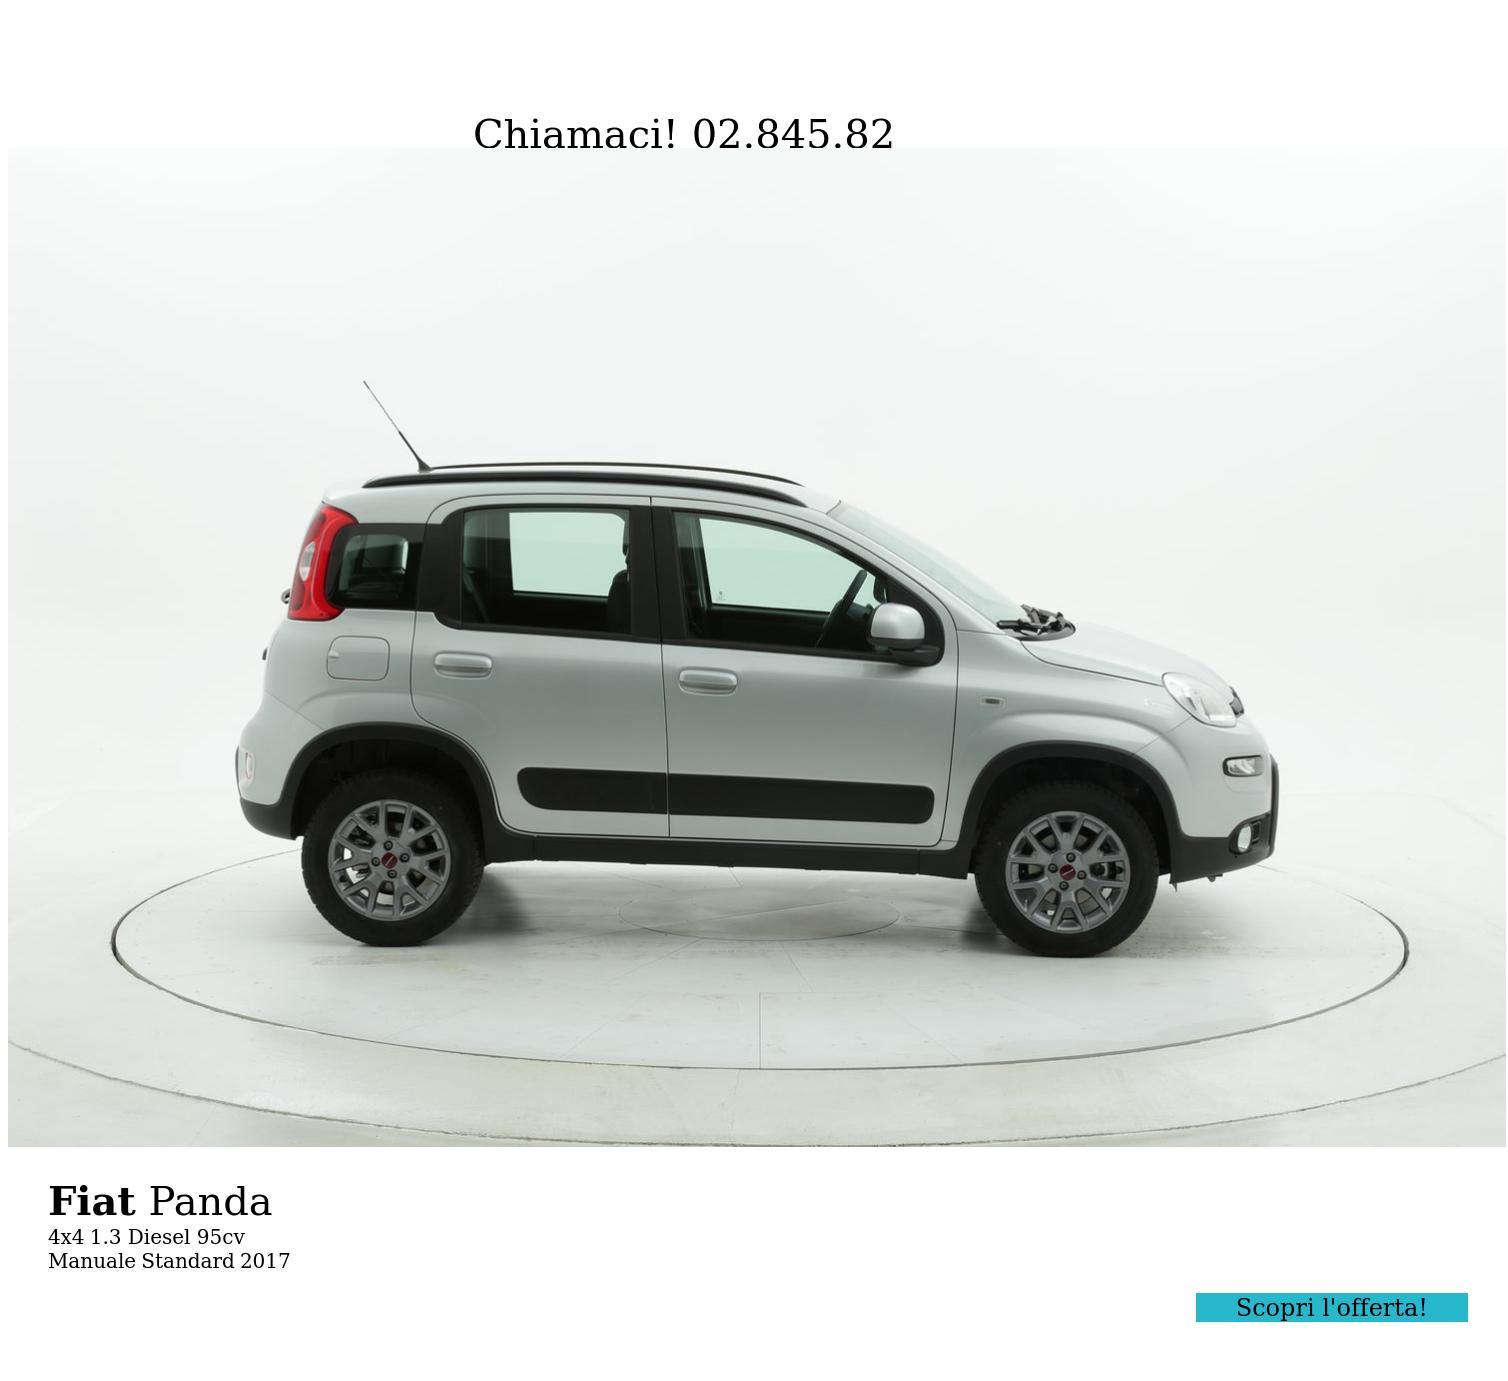 Fiat Panda 4x4 km 0 diesel argento | brumbrum